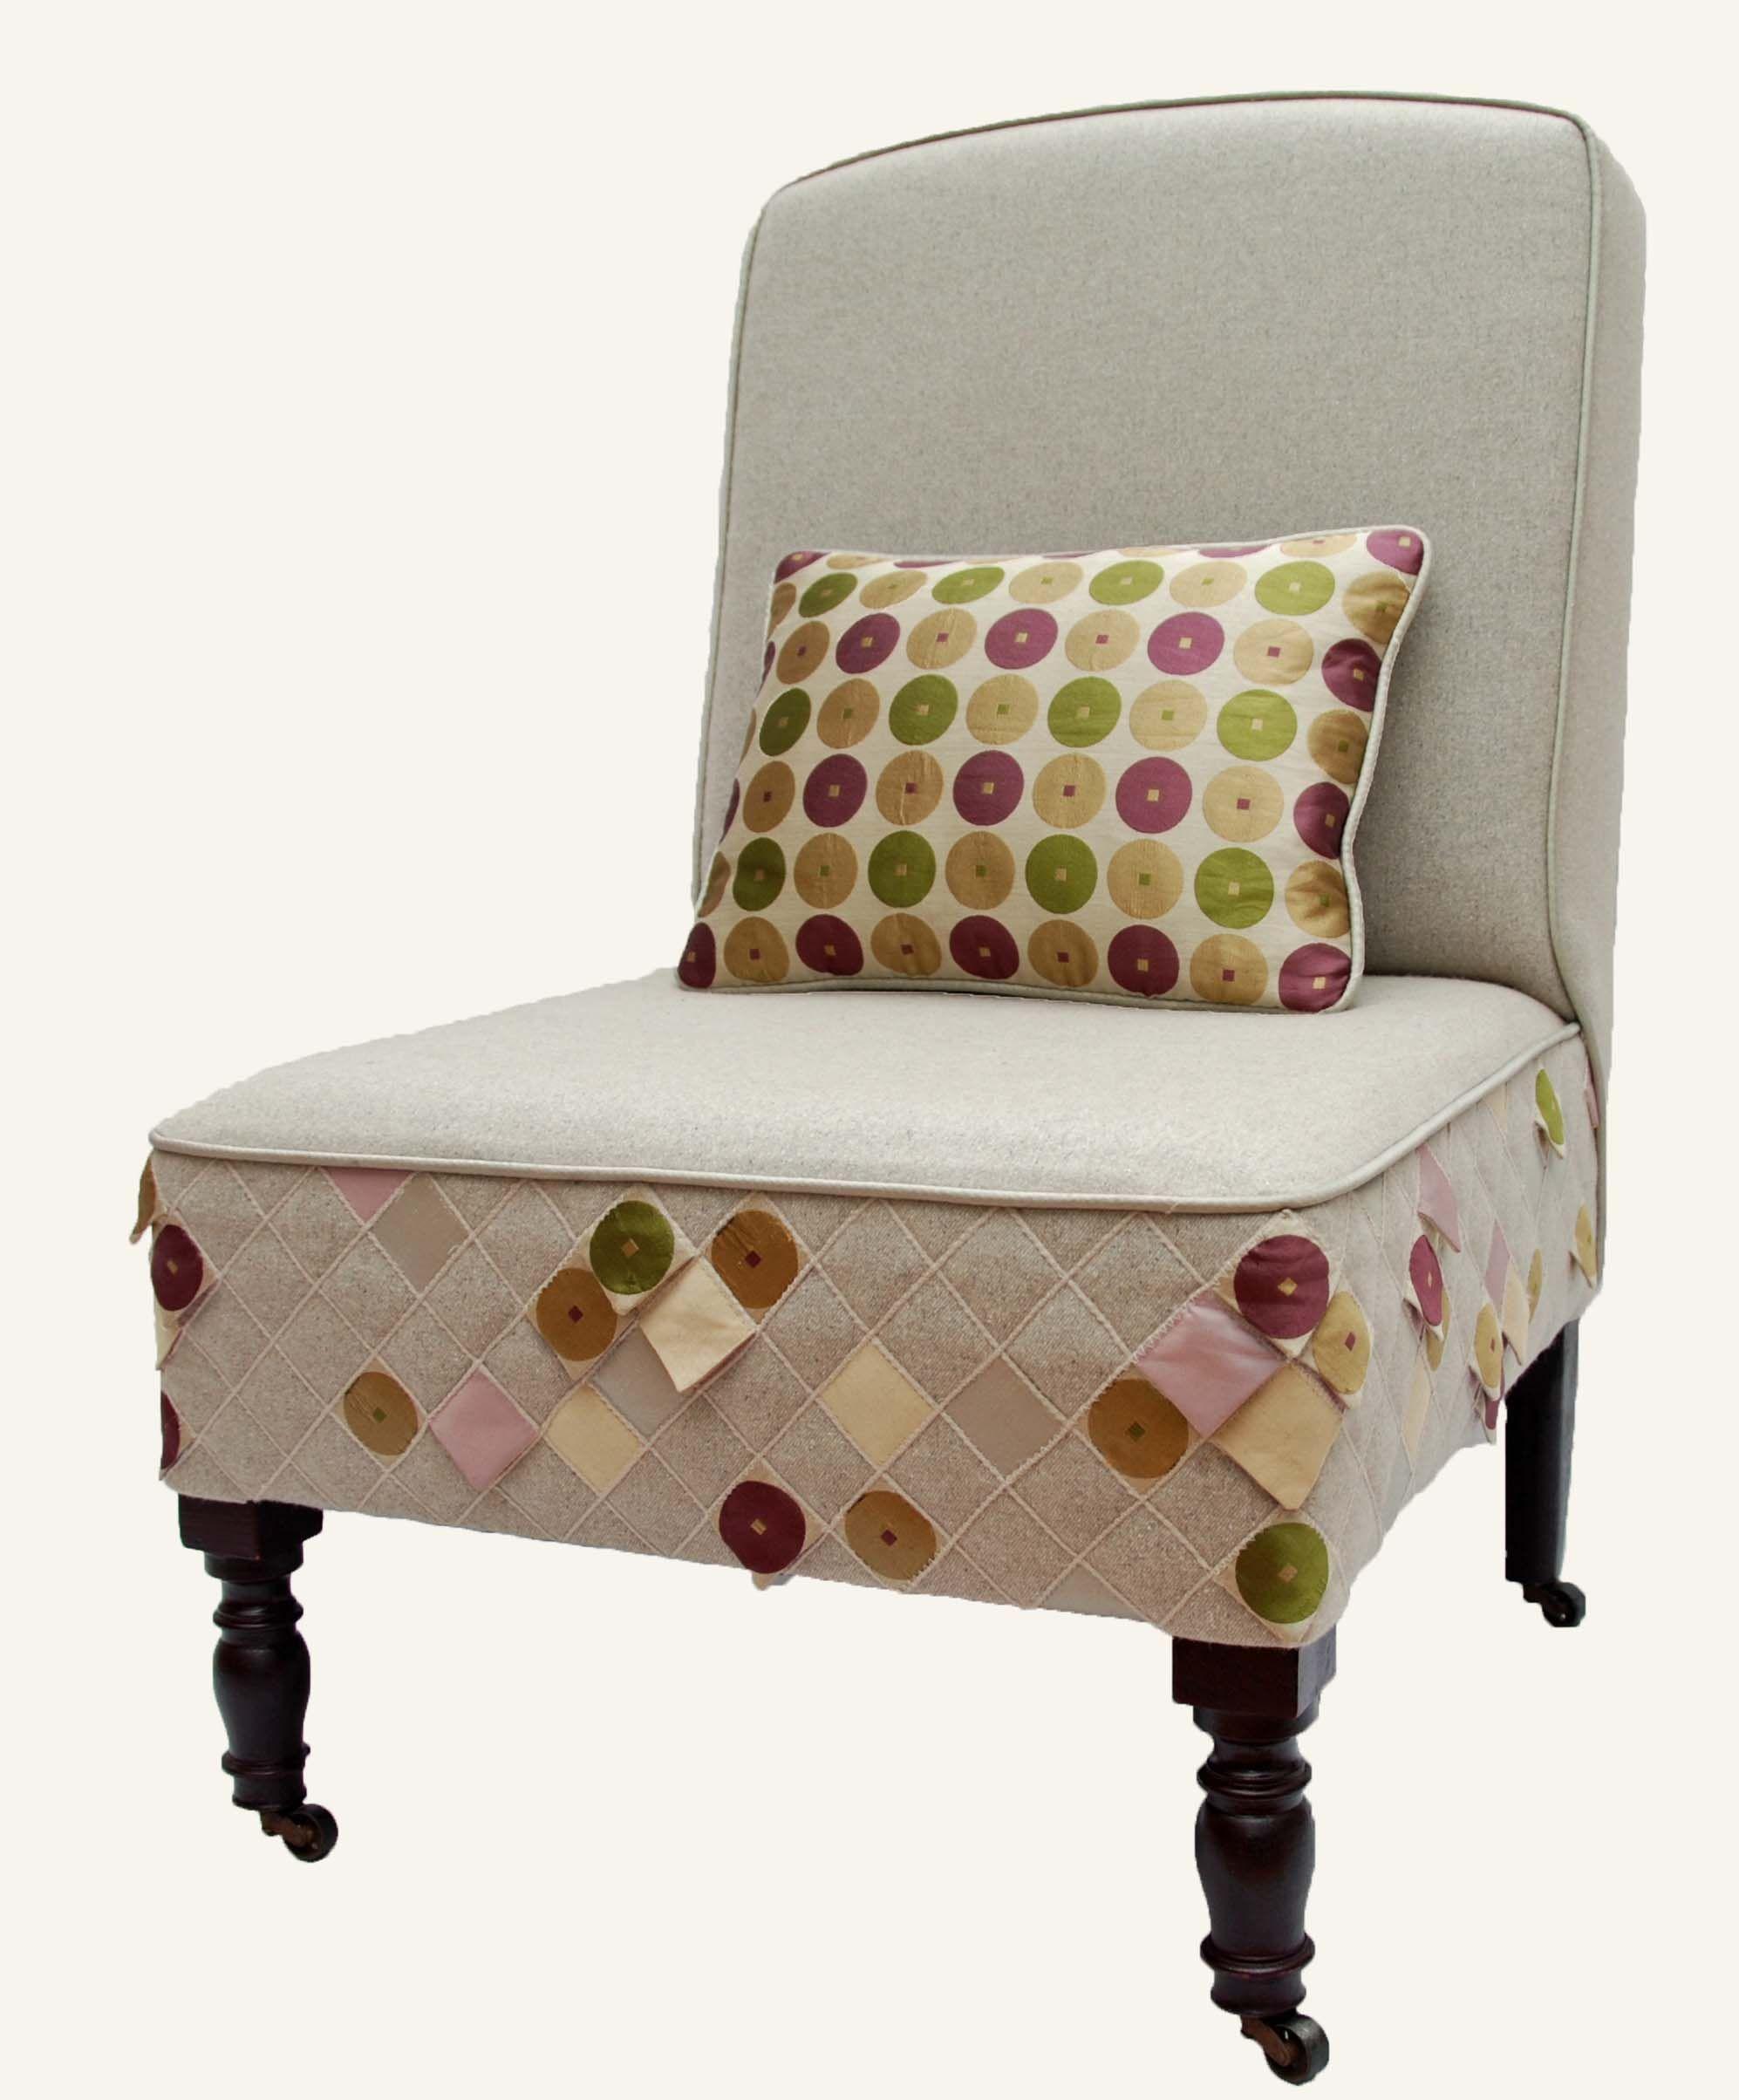 A 'petal' nursing chair. | Makers Yard Bespoke | Pinterest